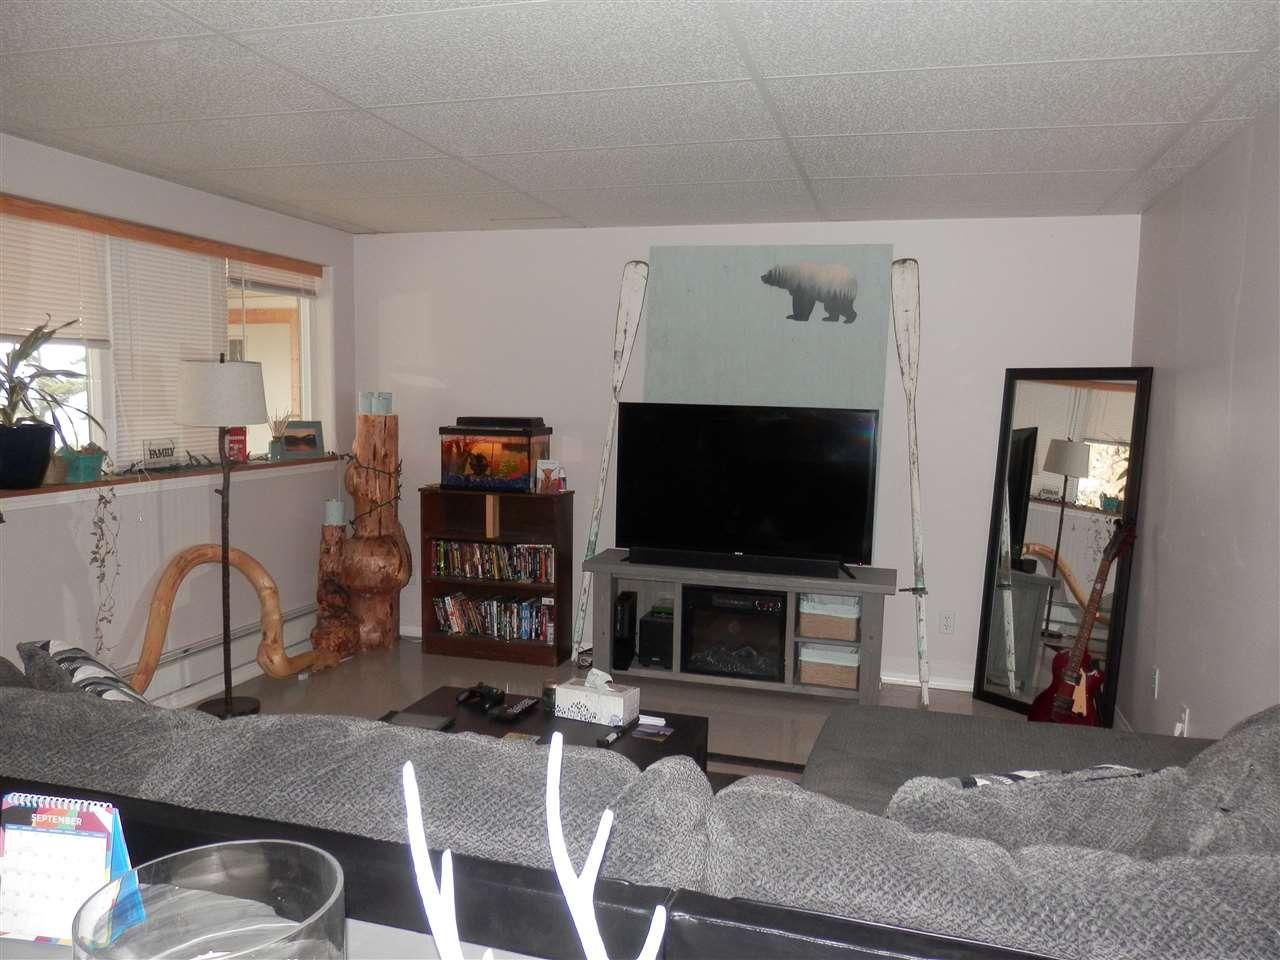 Photo 13: Photos: 935 HODGSON Road in Williams Lake: Esler/Dog Creek House for sale (Williams Lake (Zone 27))  : MLS®# R2414109